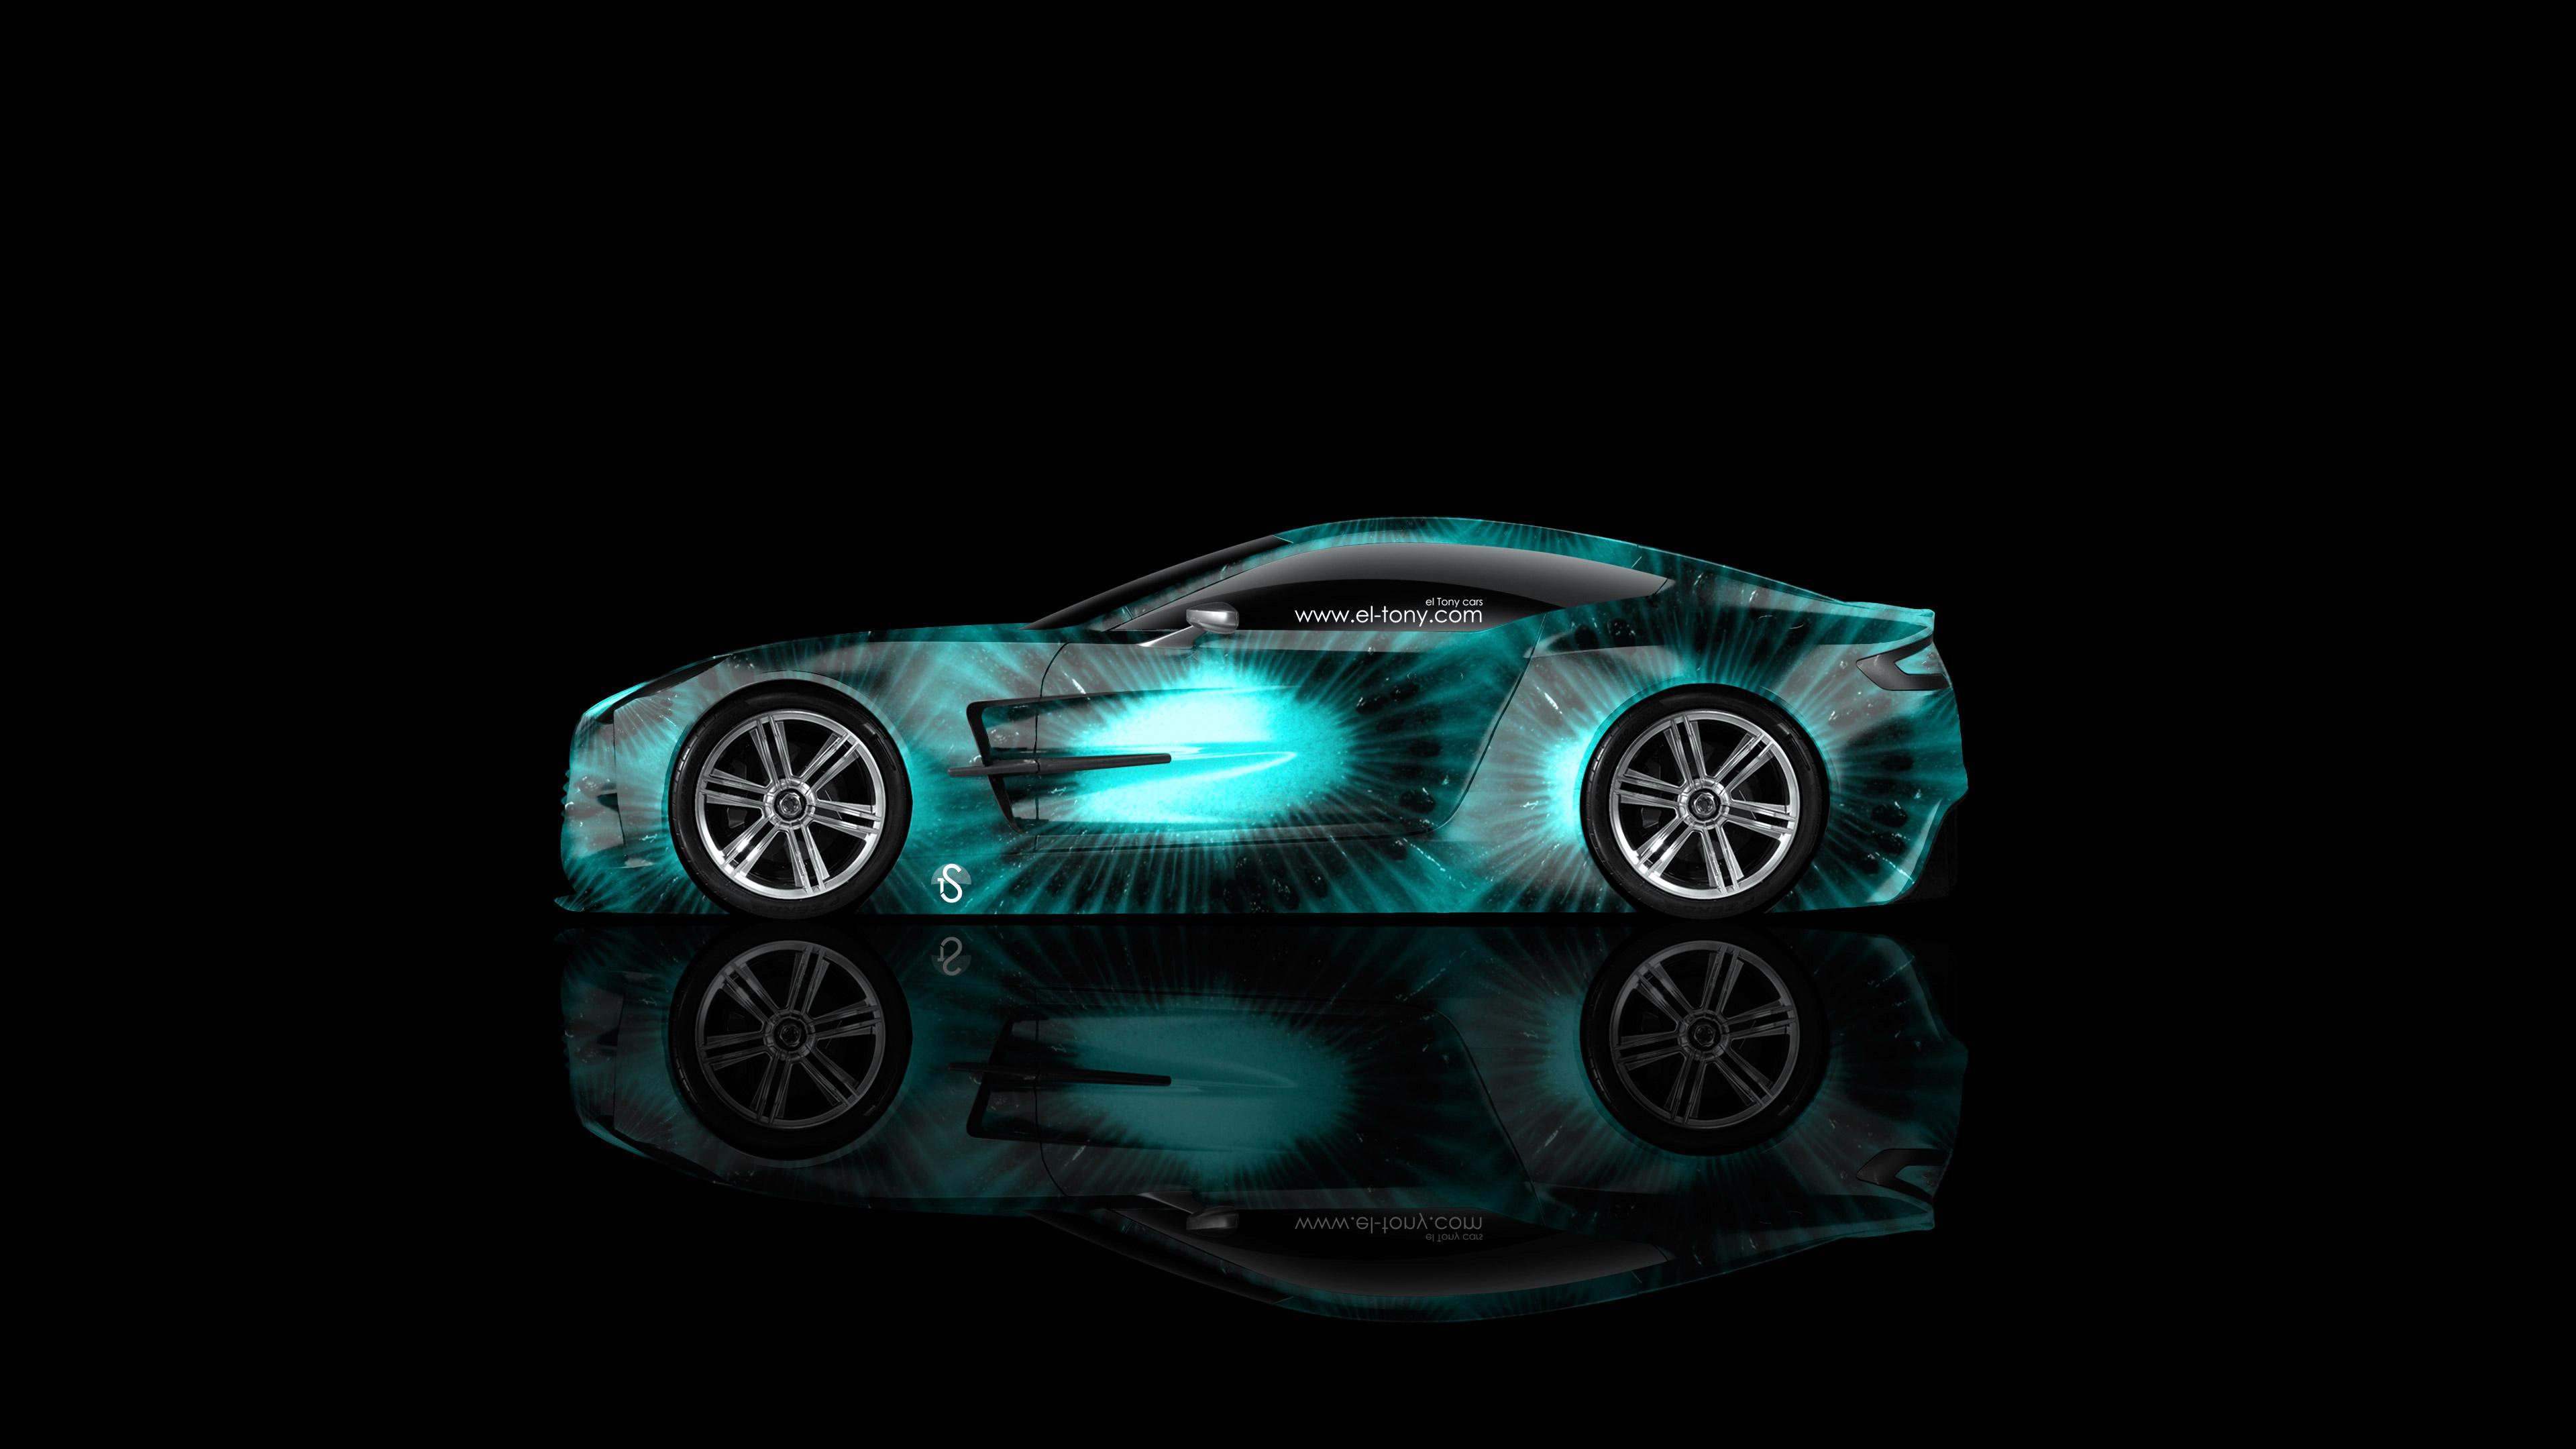 2015 4k maserati alfieri side kiwi aerography car 2015 4k aston martin 3840x2160